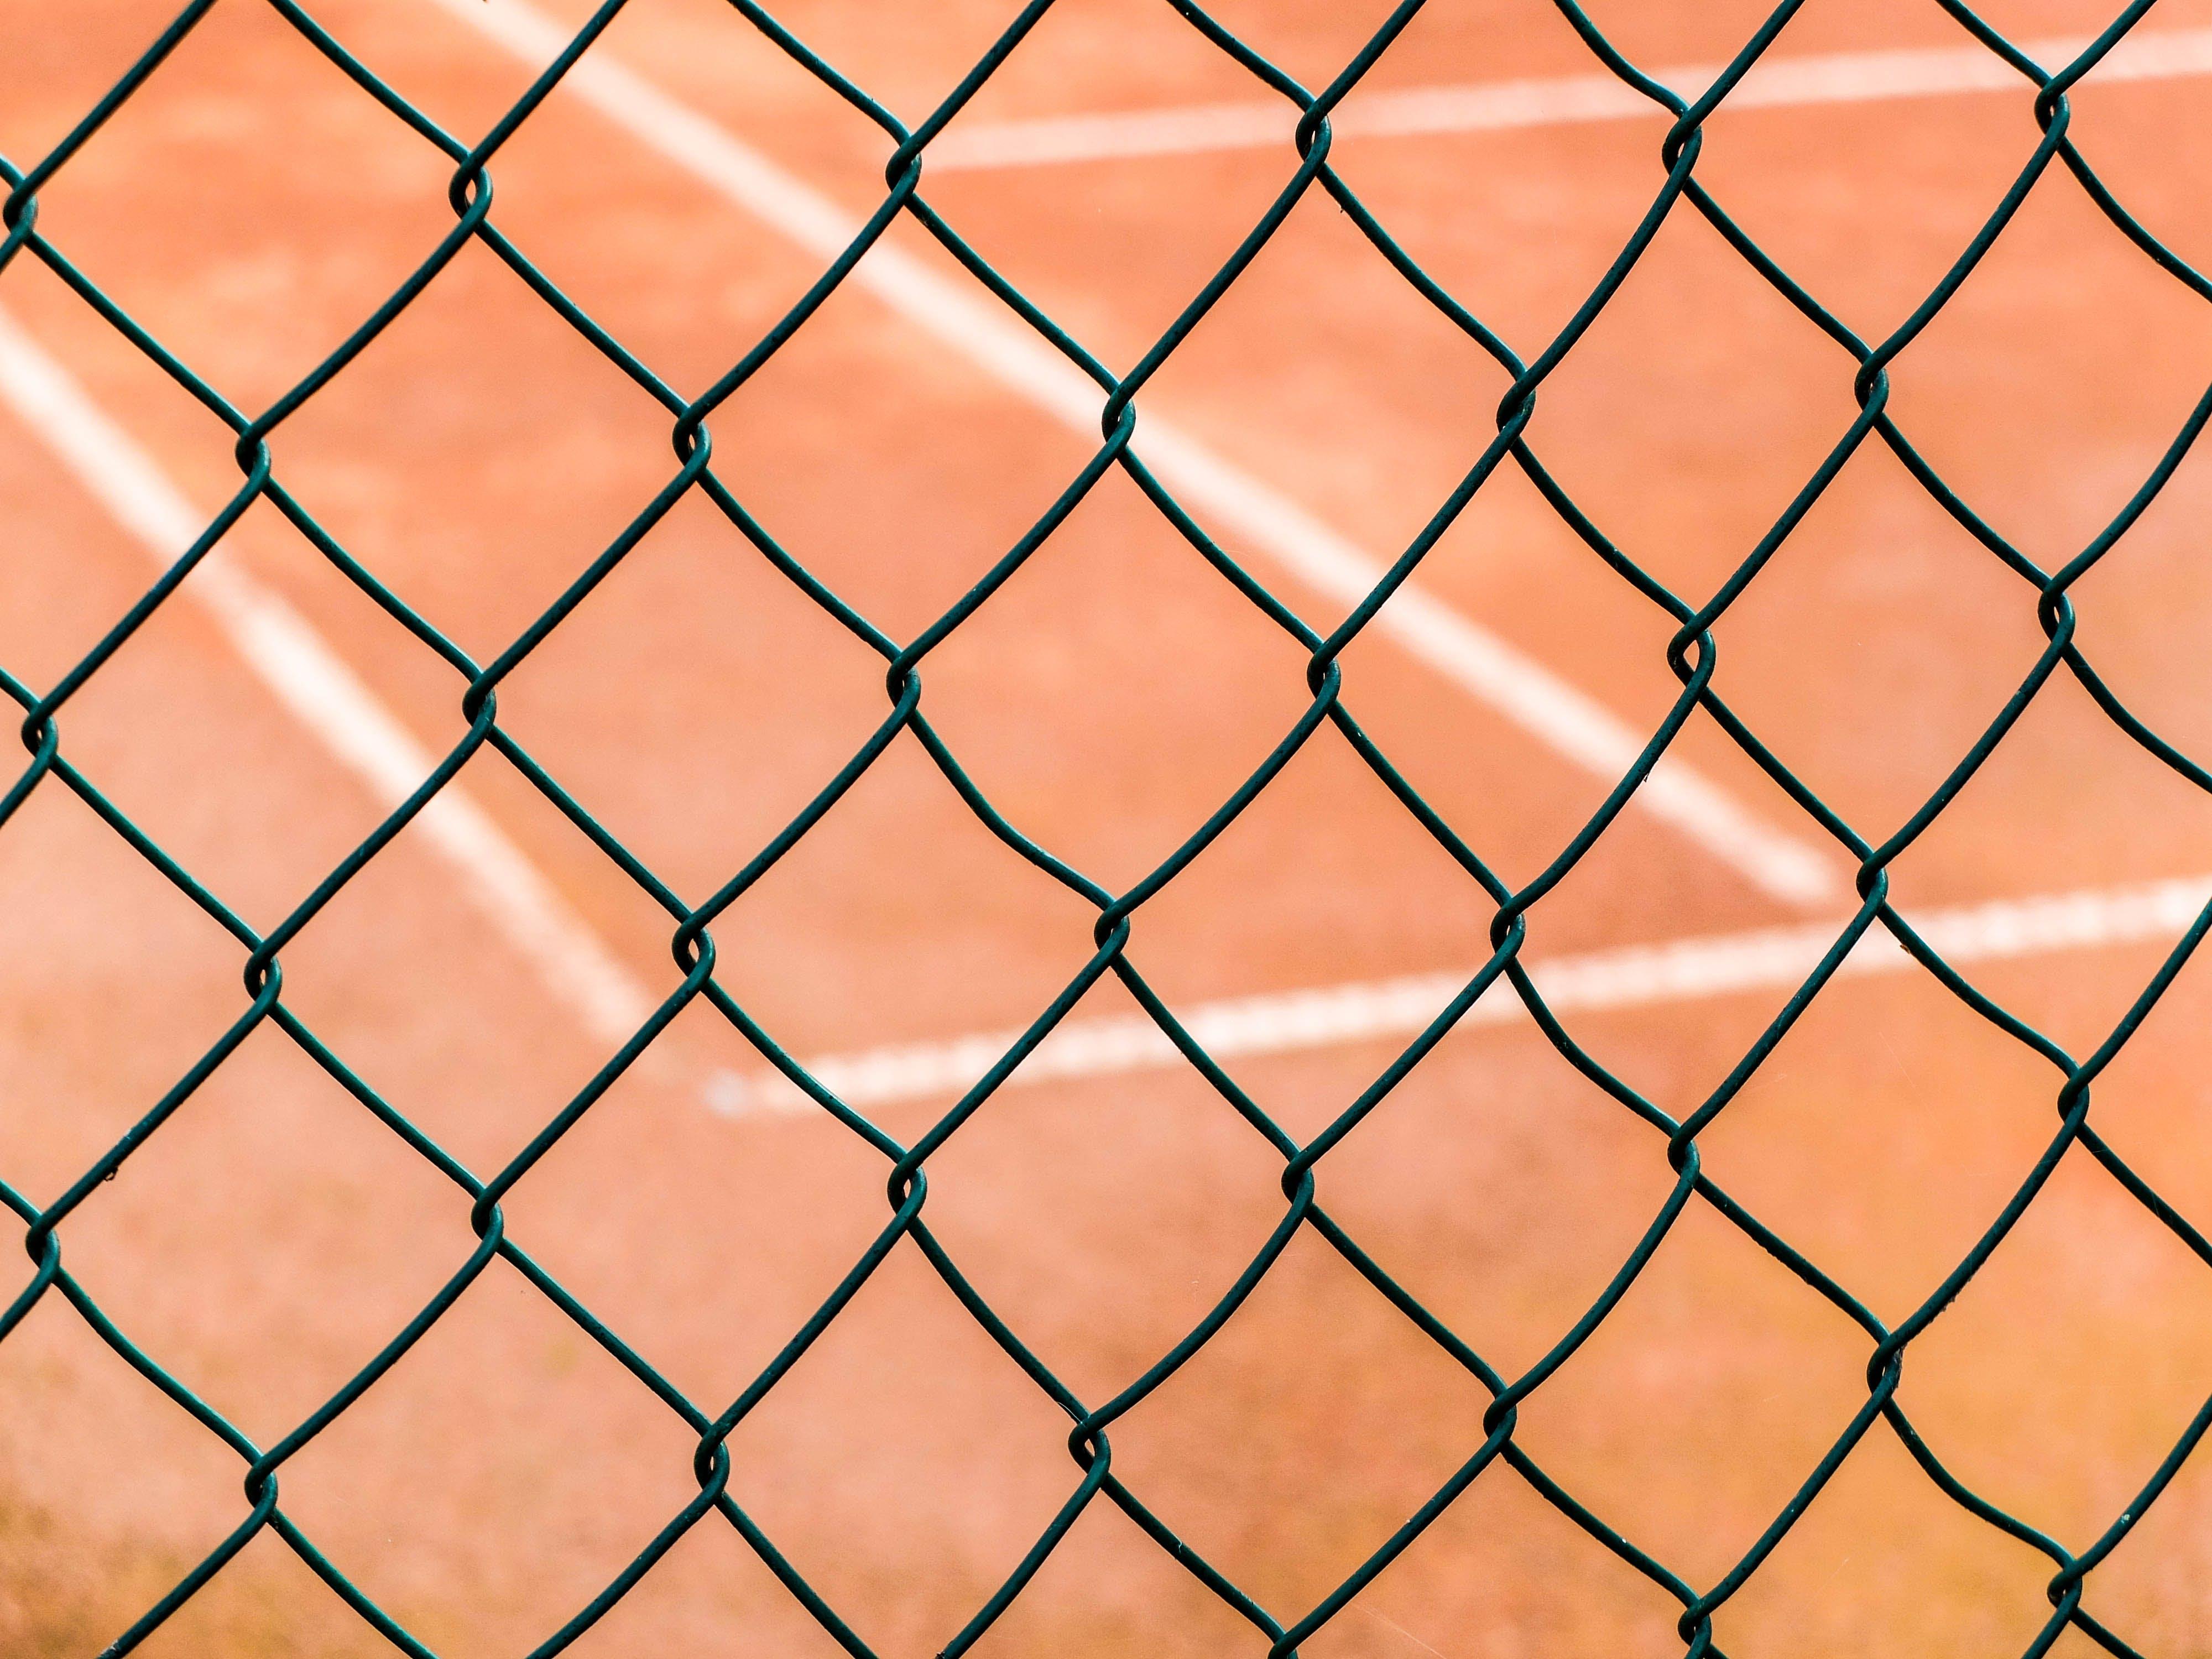 Free stock photo of chain link fence, minimal, minimalism, minimalistic